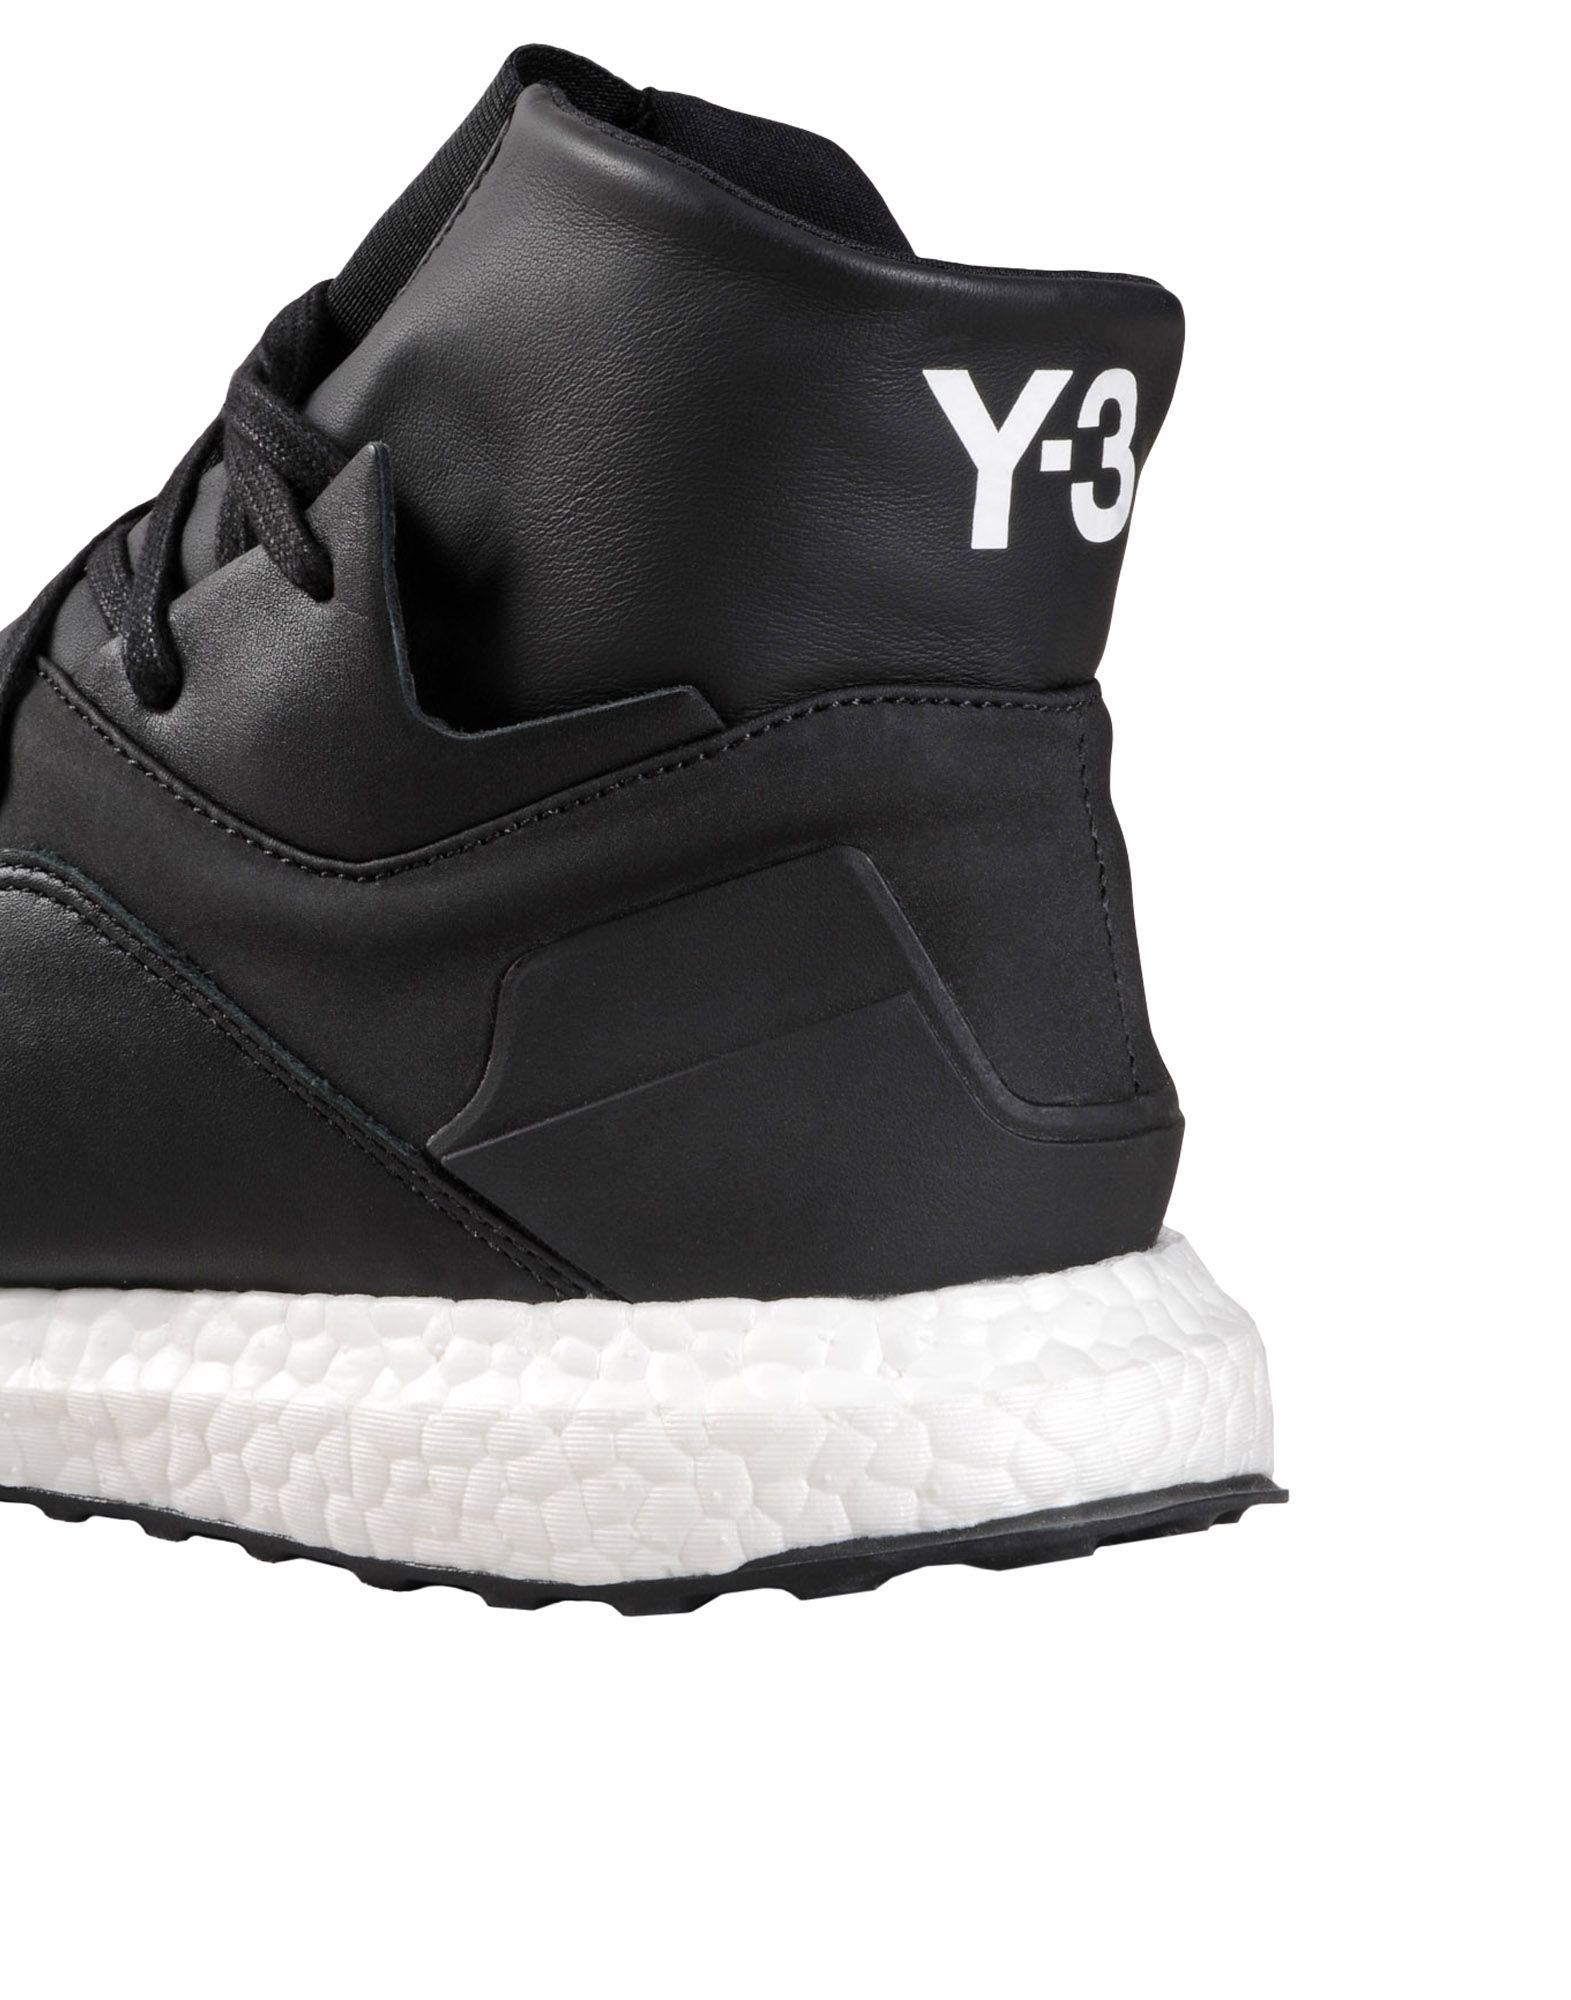 Y 3 KOZOKO HIGH High Top Sneakers   Adidas Y 3 Official Site